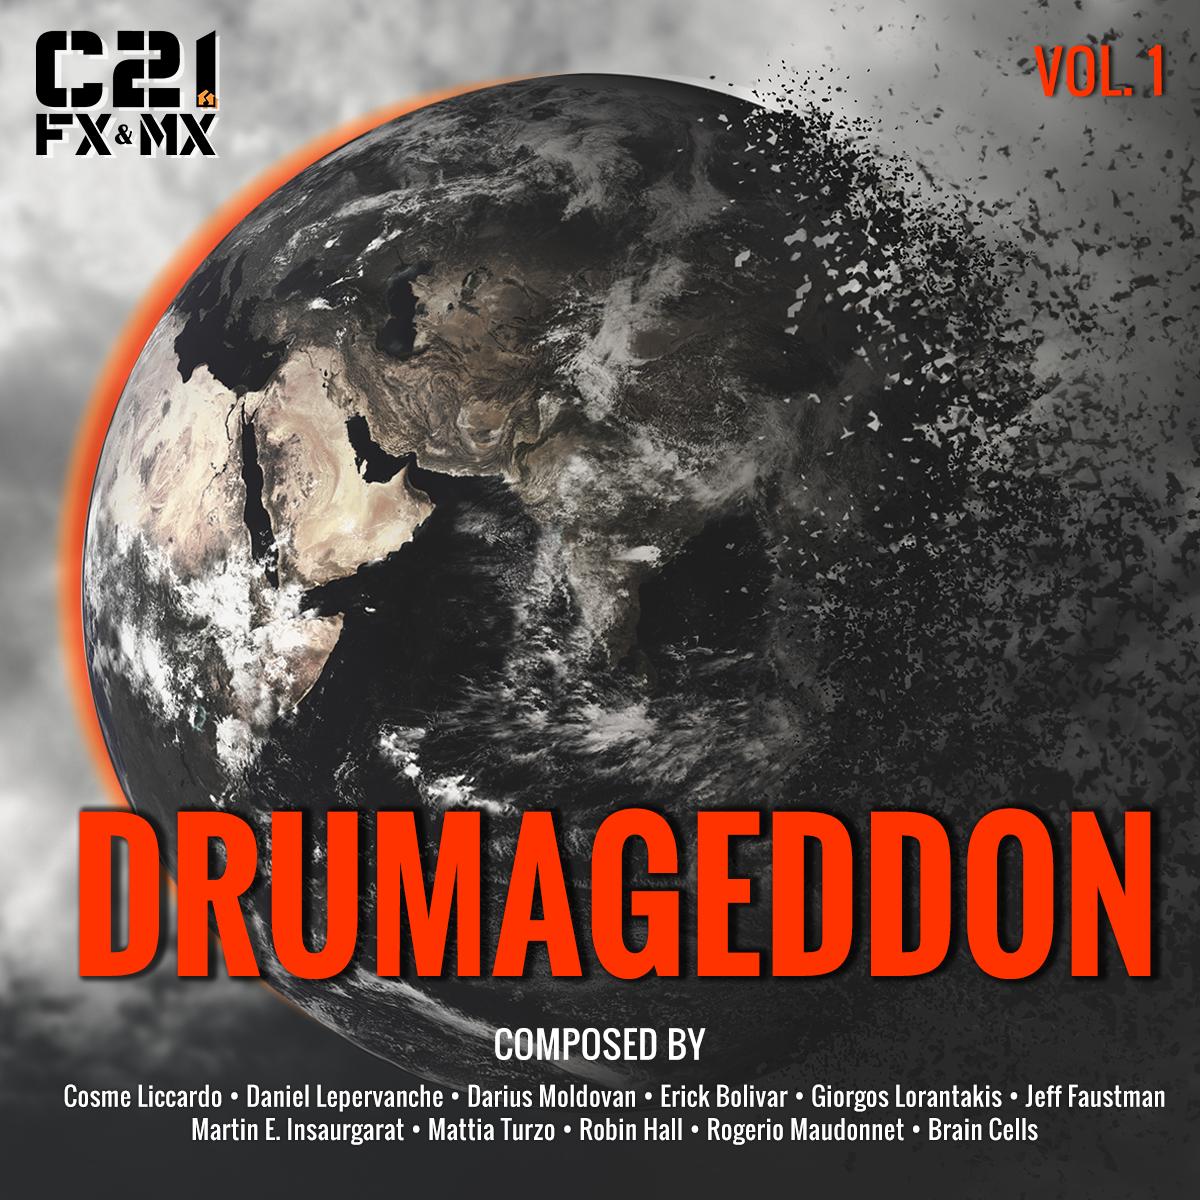 DrumageddonSquare.png